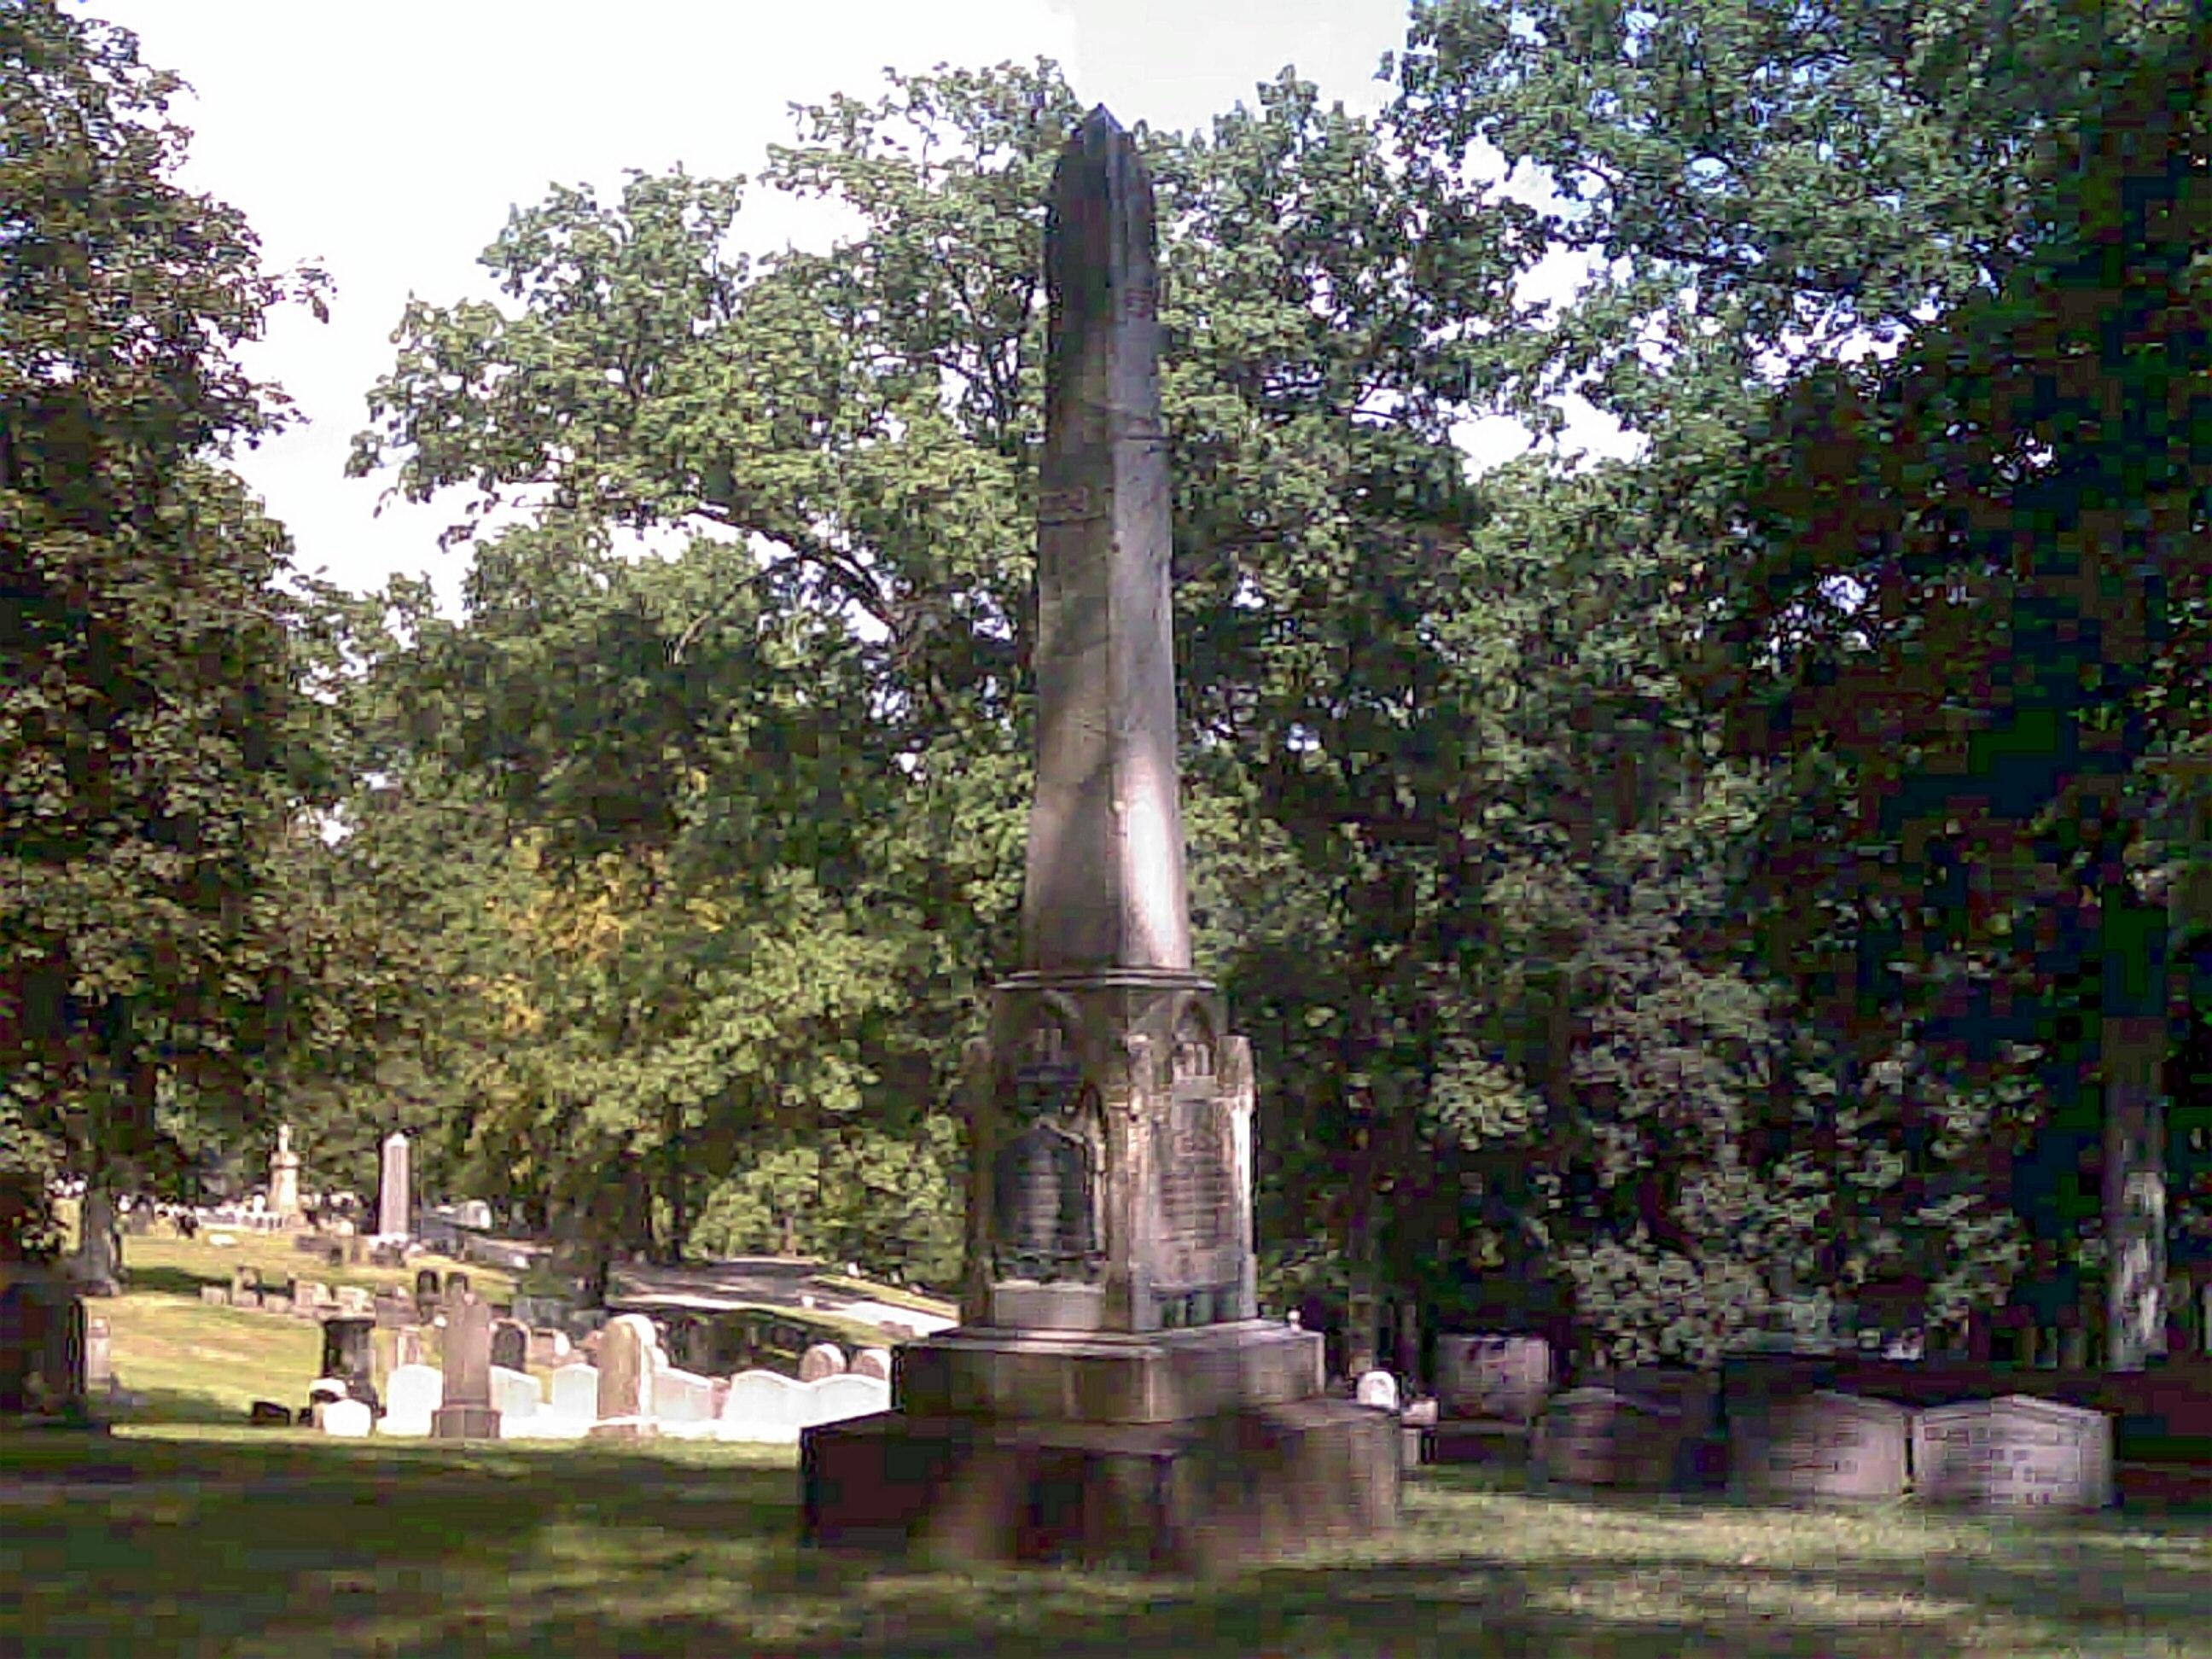 http://buhlplanetarium2.tripod.com/weblog/grahamscorner/pix/dean/p_Dean_Monument.jpg